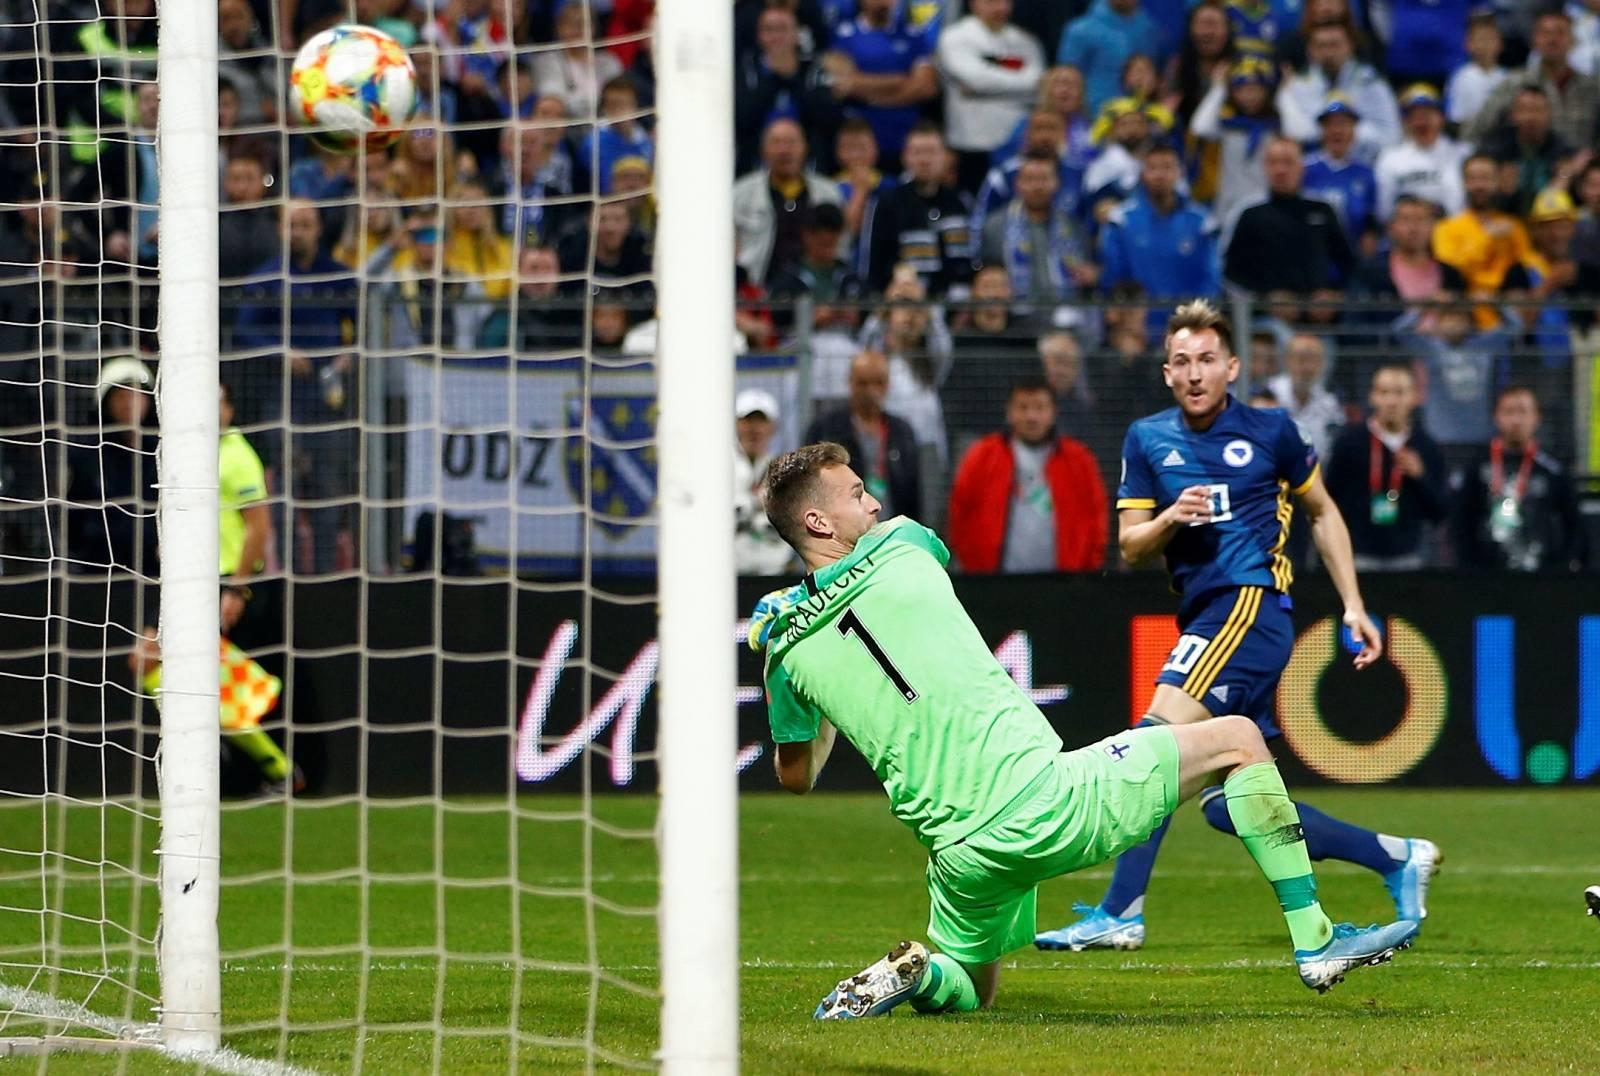 Euro 2020 Qualifier - Group J - Bosnia and Herzegovina v Finland